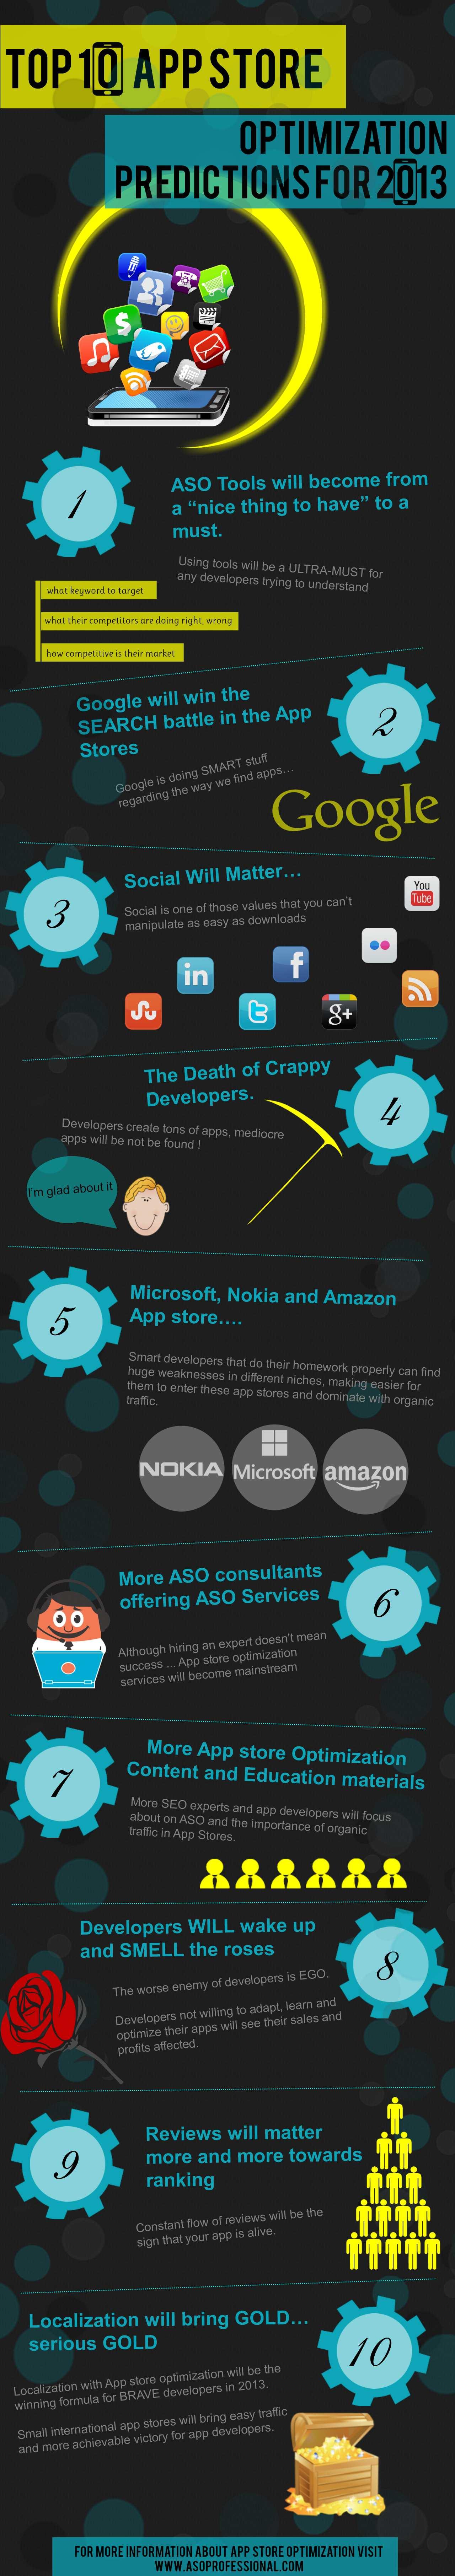 asopredictions2013.jpg 1,280×7,250 pixels App marketing